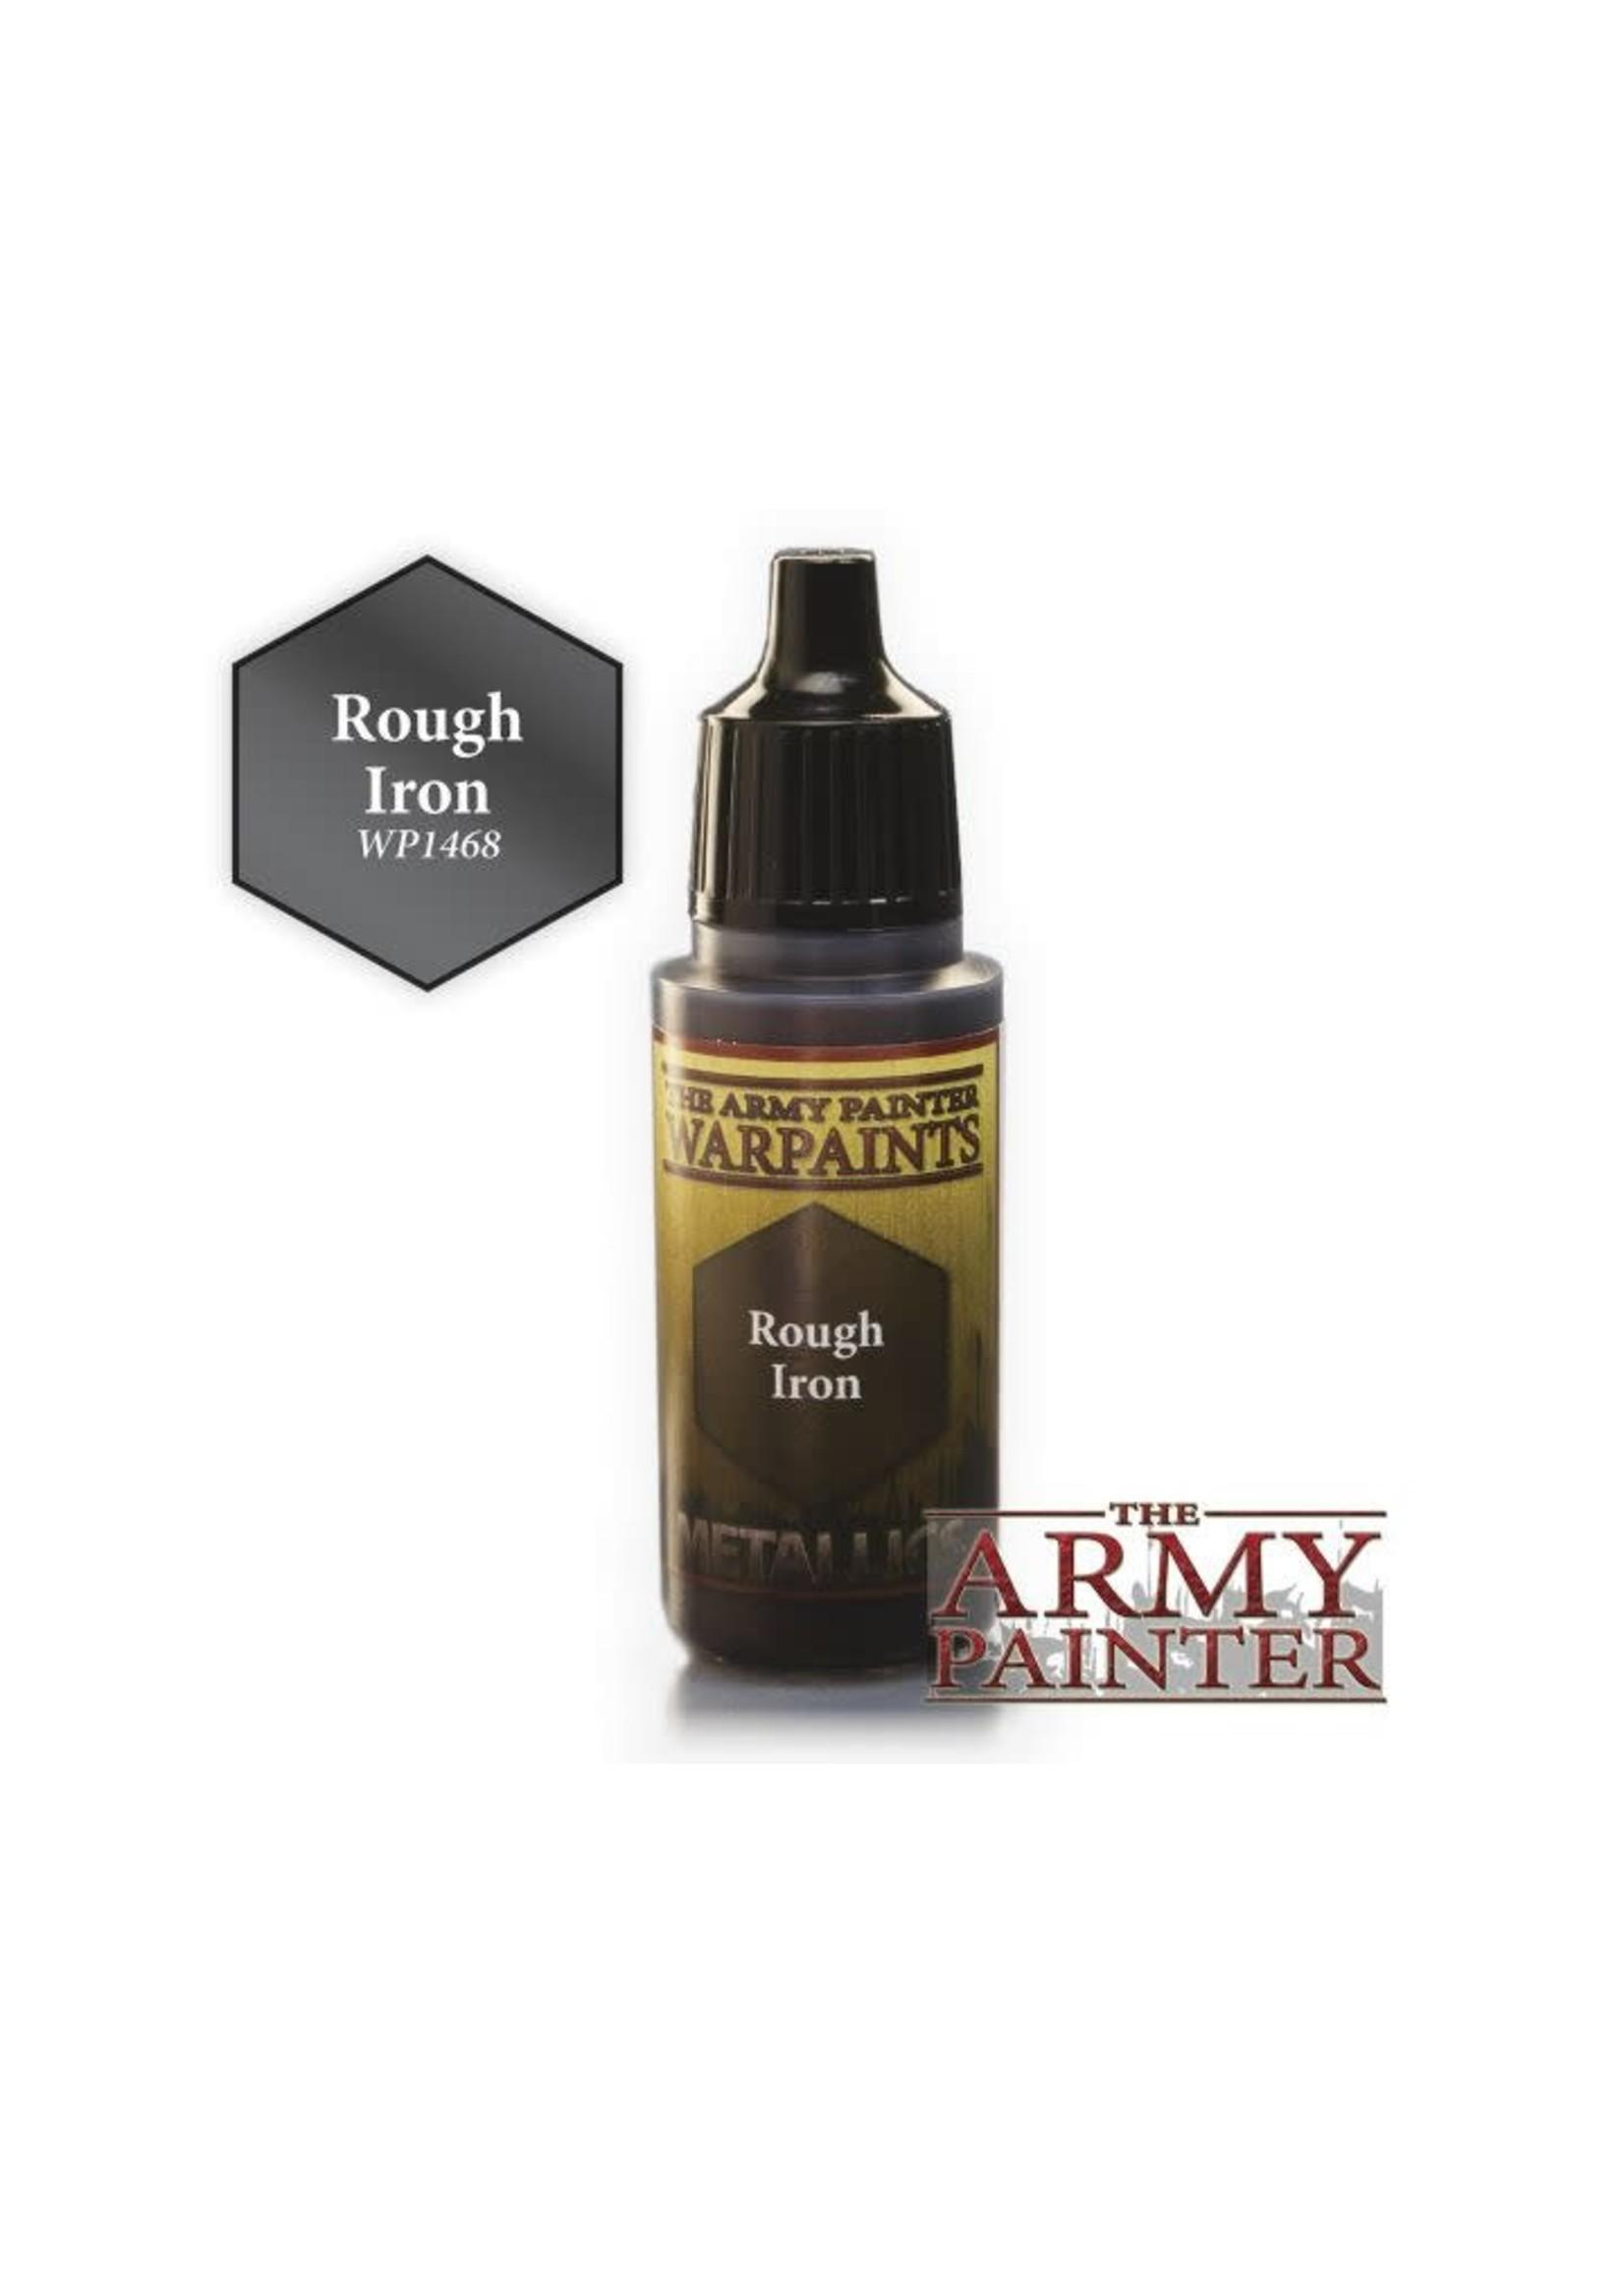 Army Painter Warpaints - Rough Iron